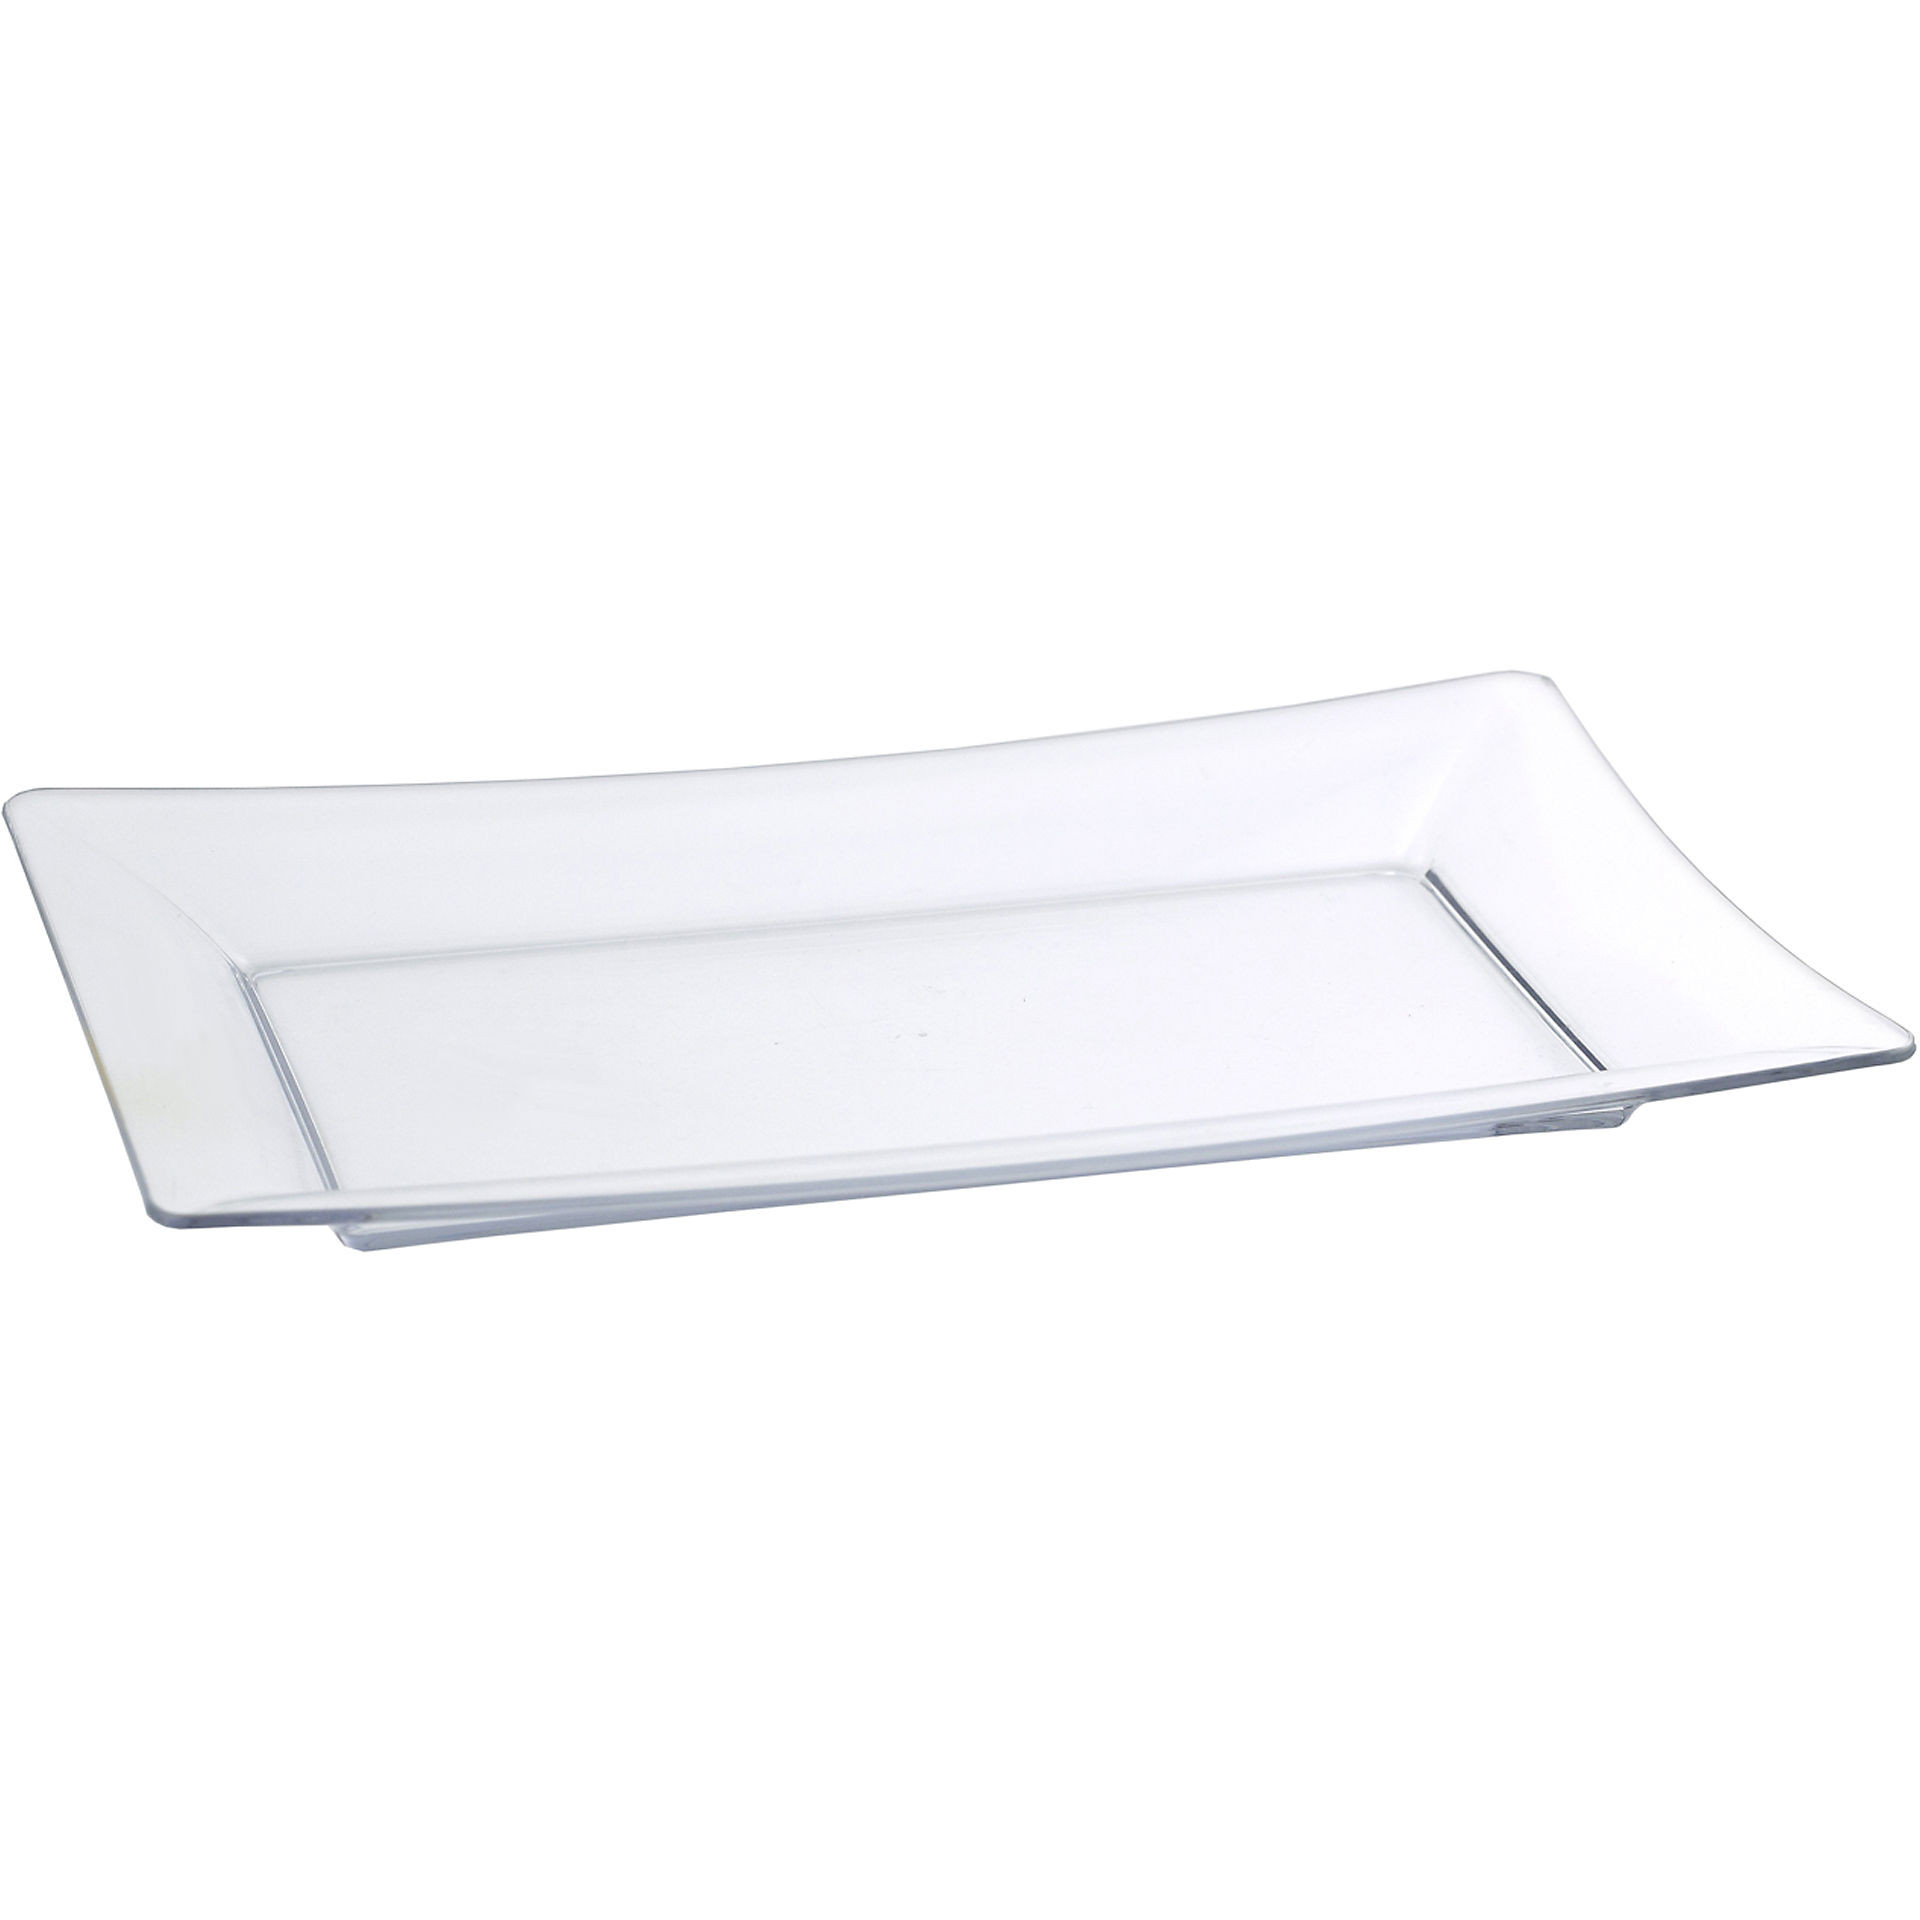 Acrylic Click Clack Serving Platter, 17 x 10.5 Inch